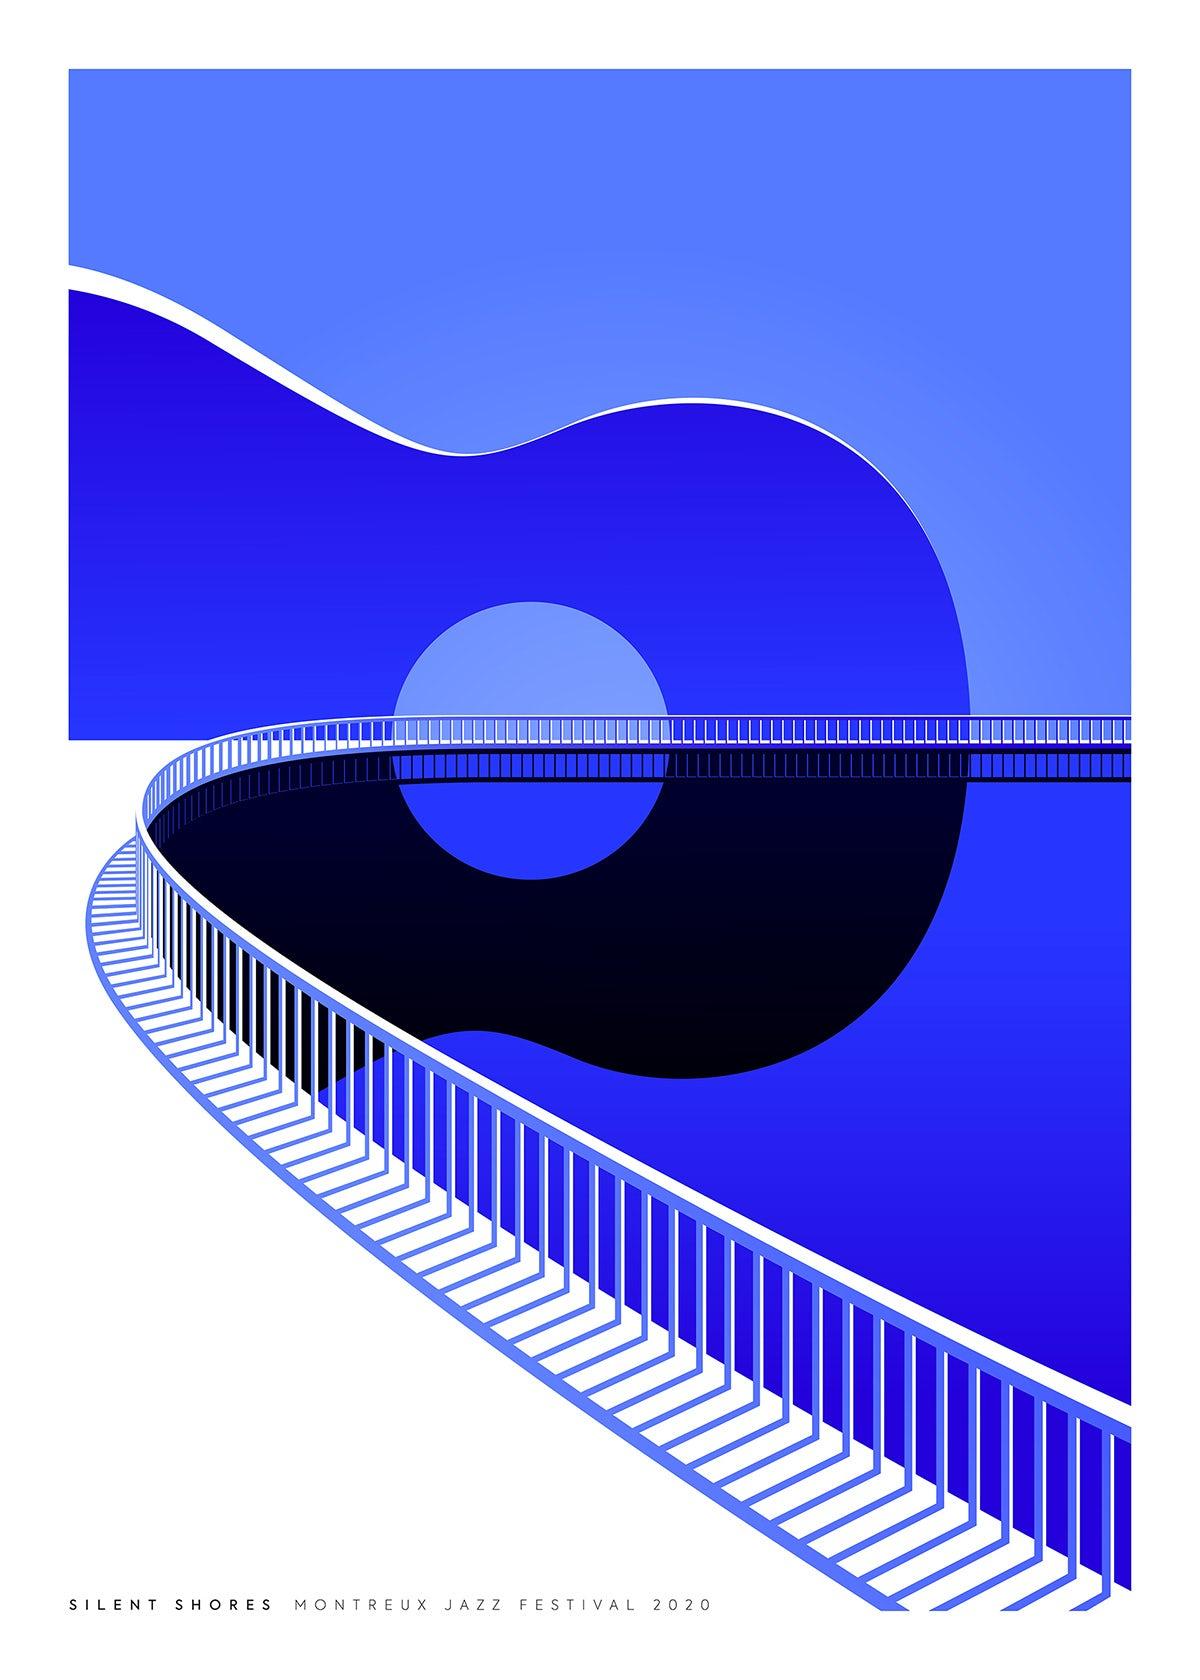 MJF20-Silent-Shores-Affiches-FrancBord-Malika-Favre